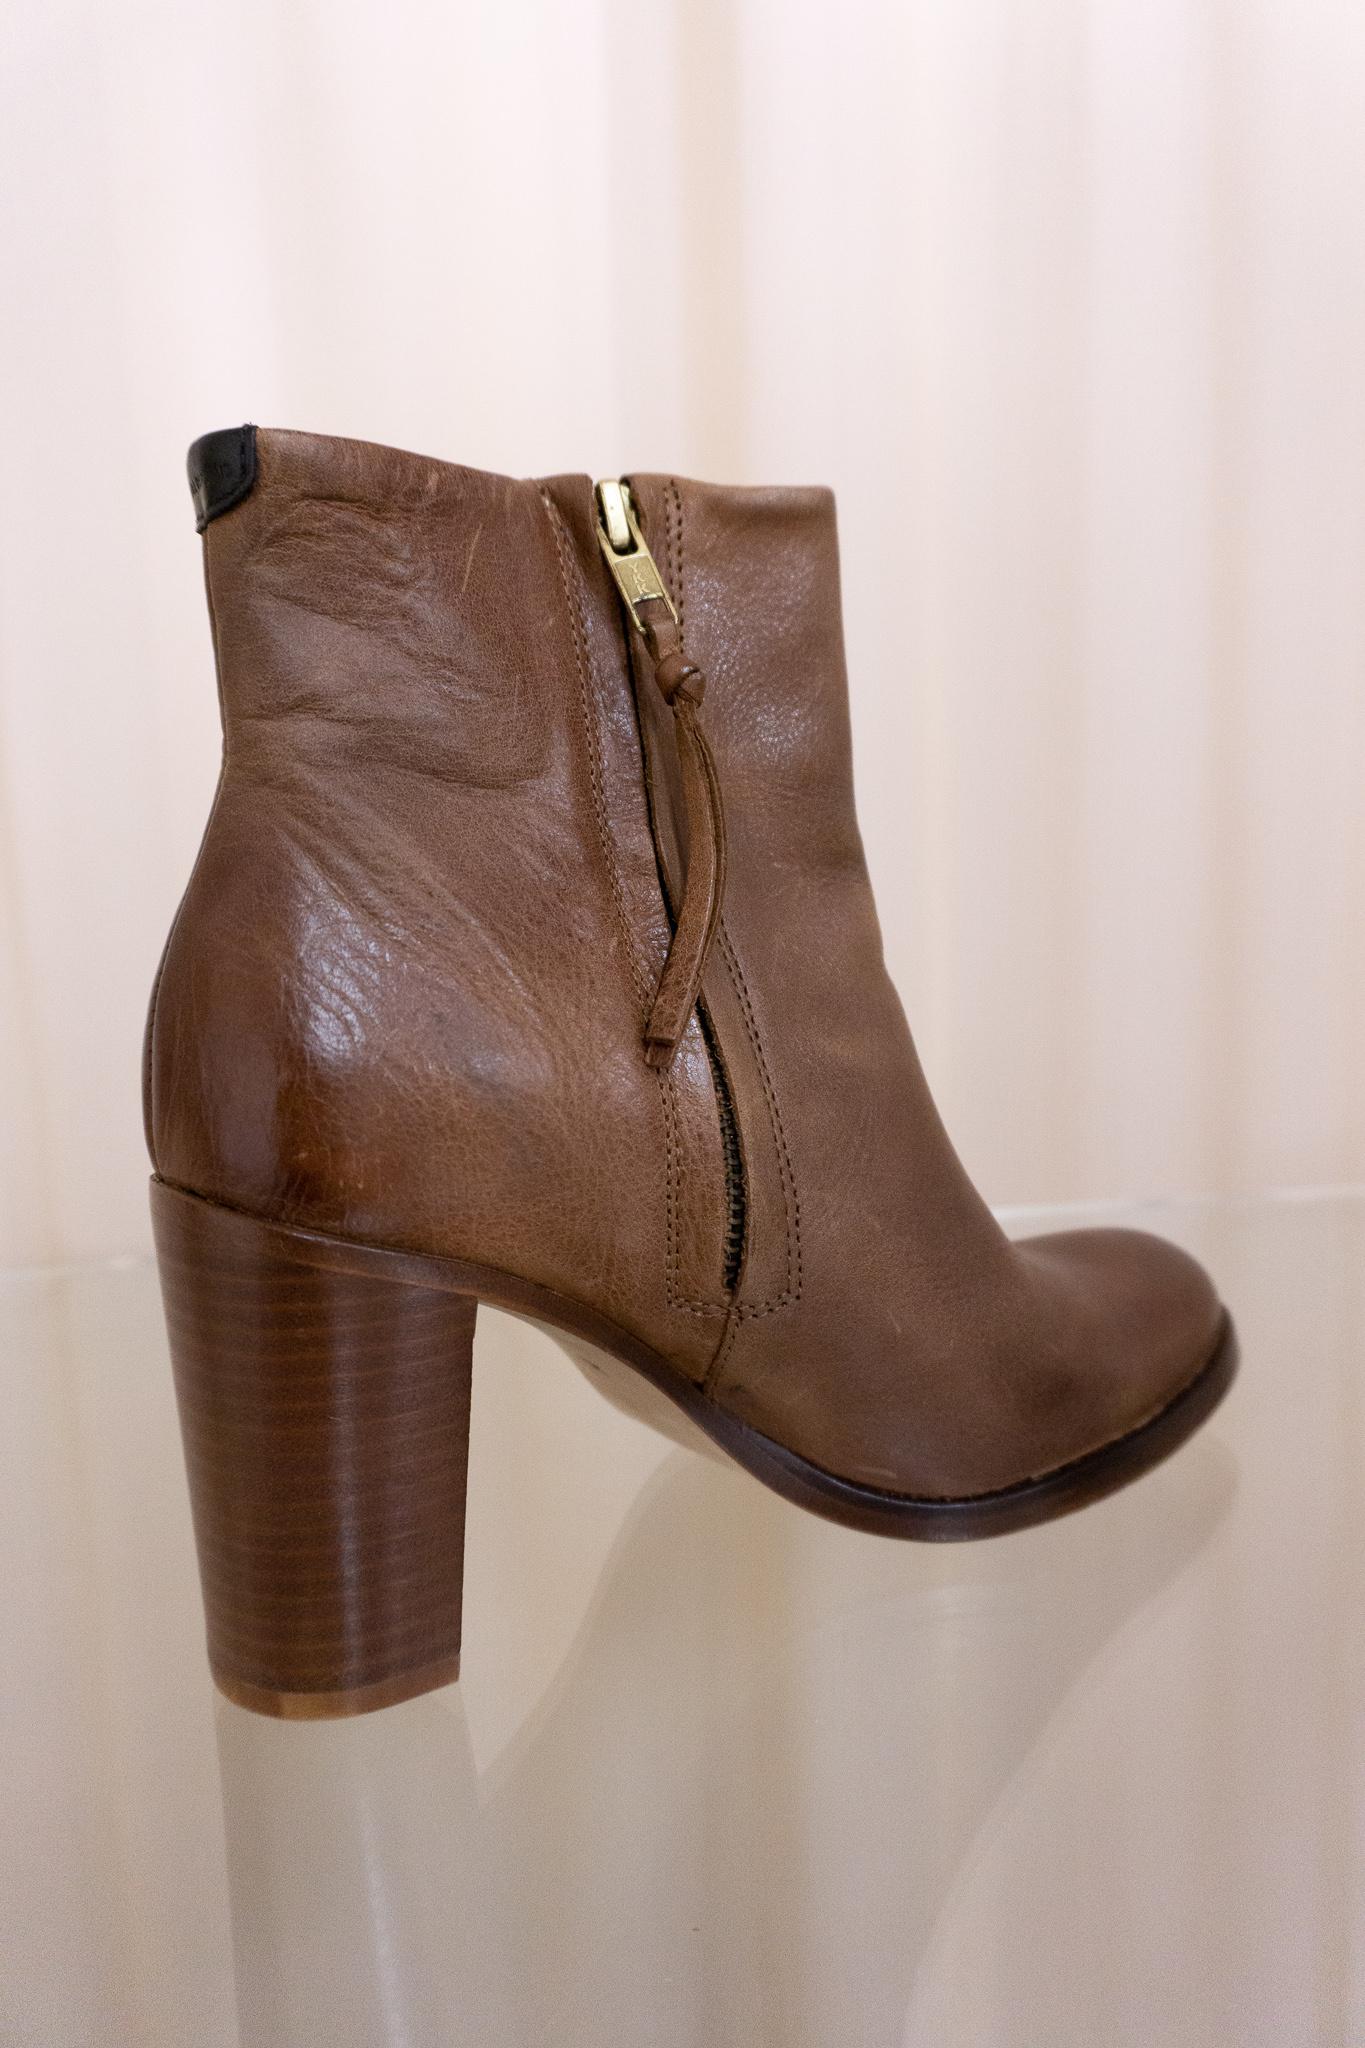 Jolie boots brown